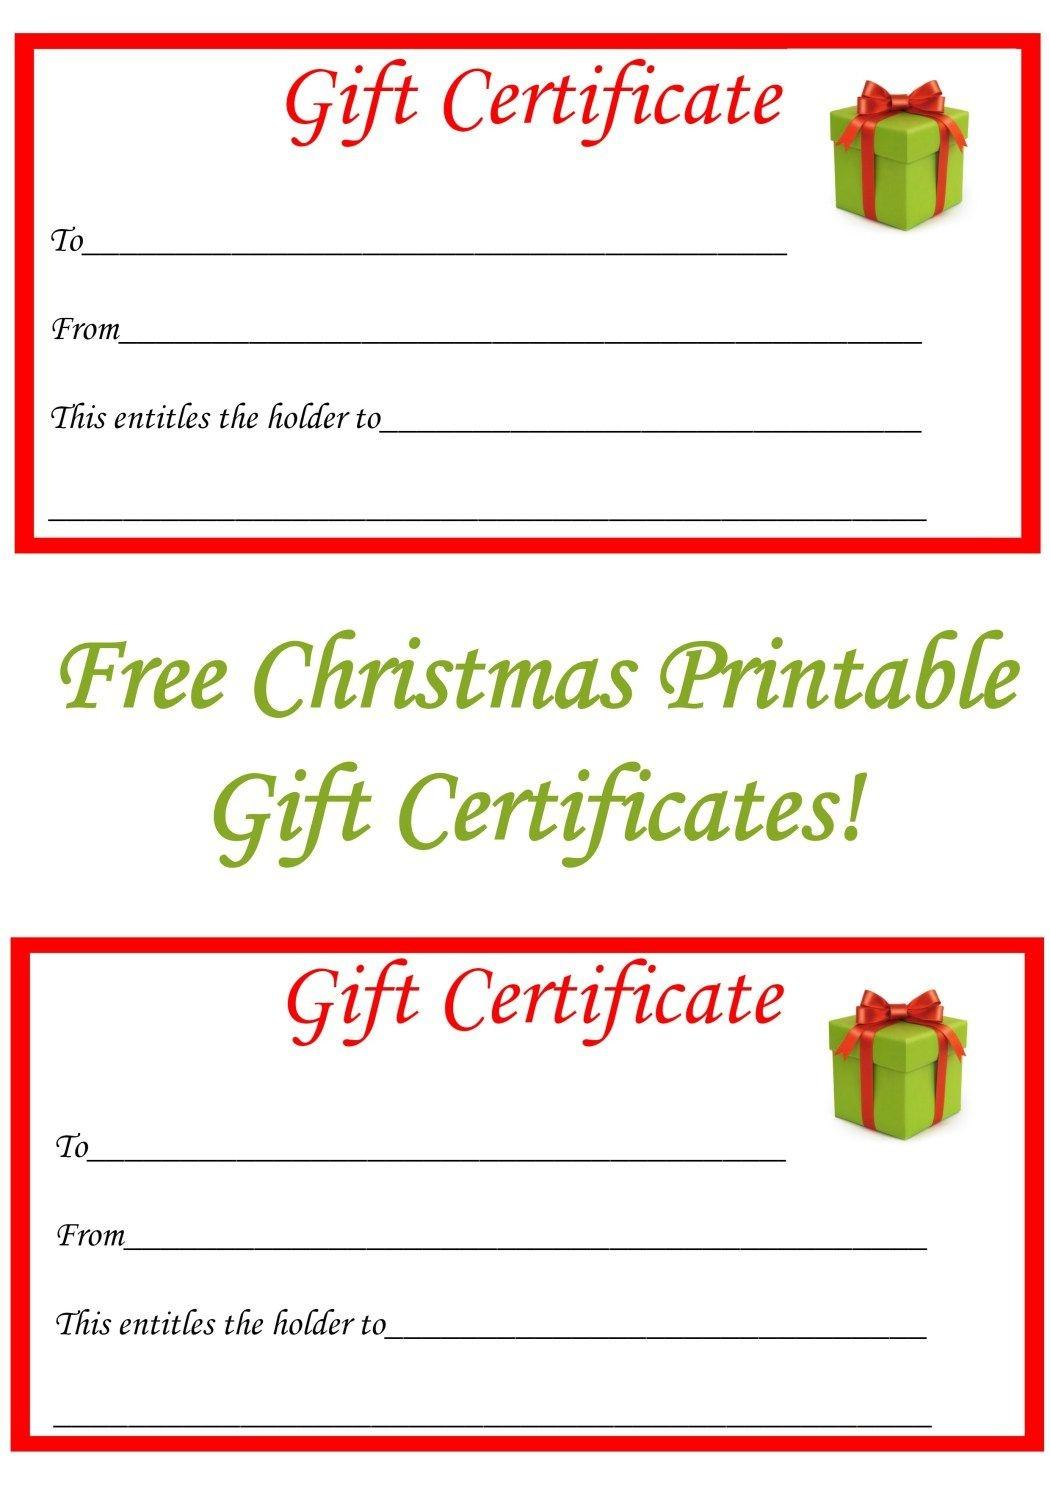 Free Christmas Printable Gift Certificates   Gift Ideas   Christmas - Free Printable Xmas Gift Certificates